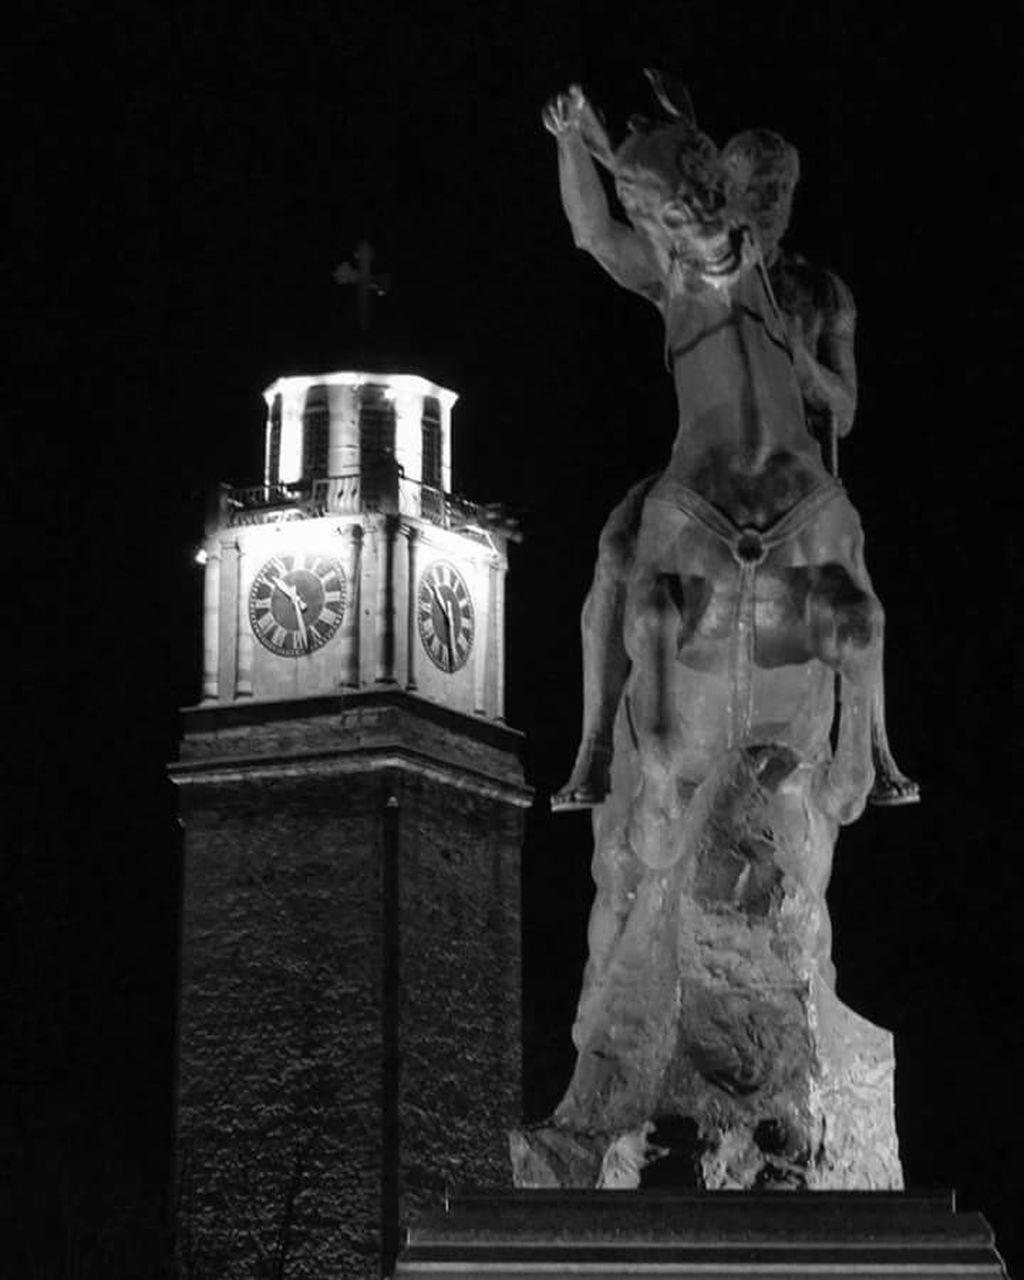 statue, night, sculpture, human representation, illuminated, no people, christmas decoration, clock, outdoors, time